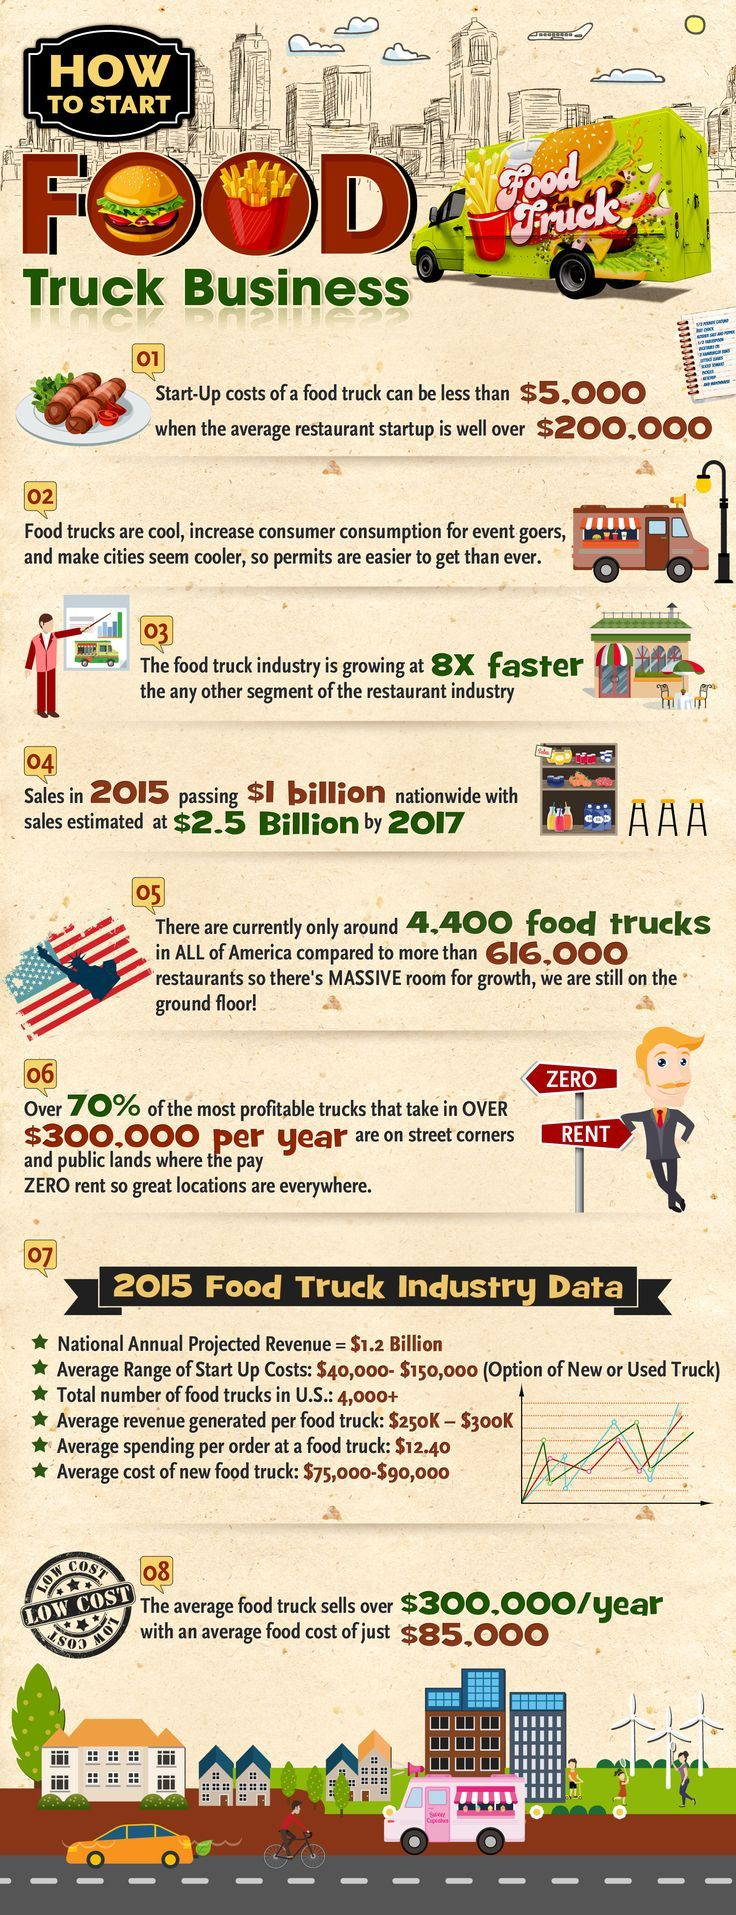 Best City For Food Truckss